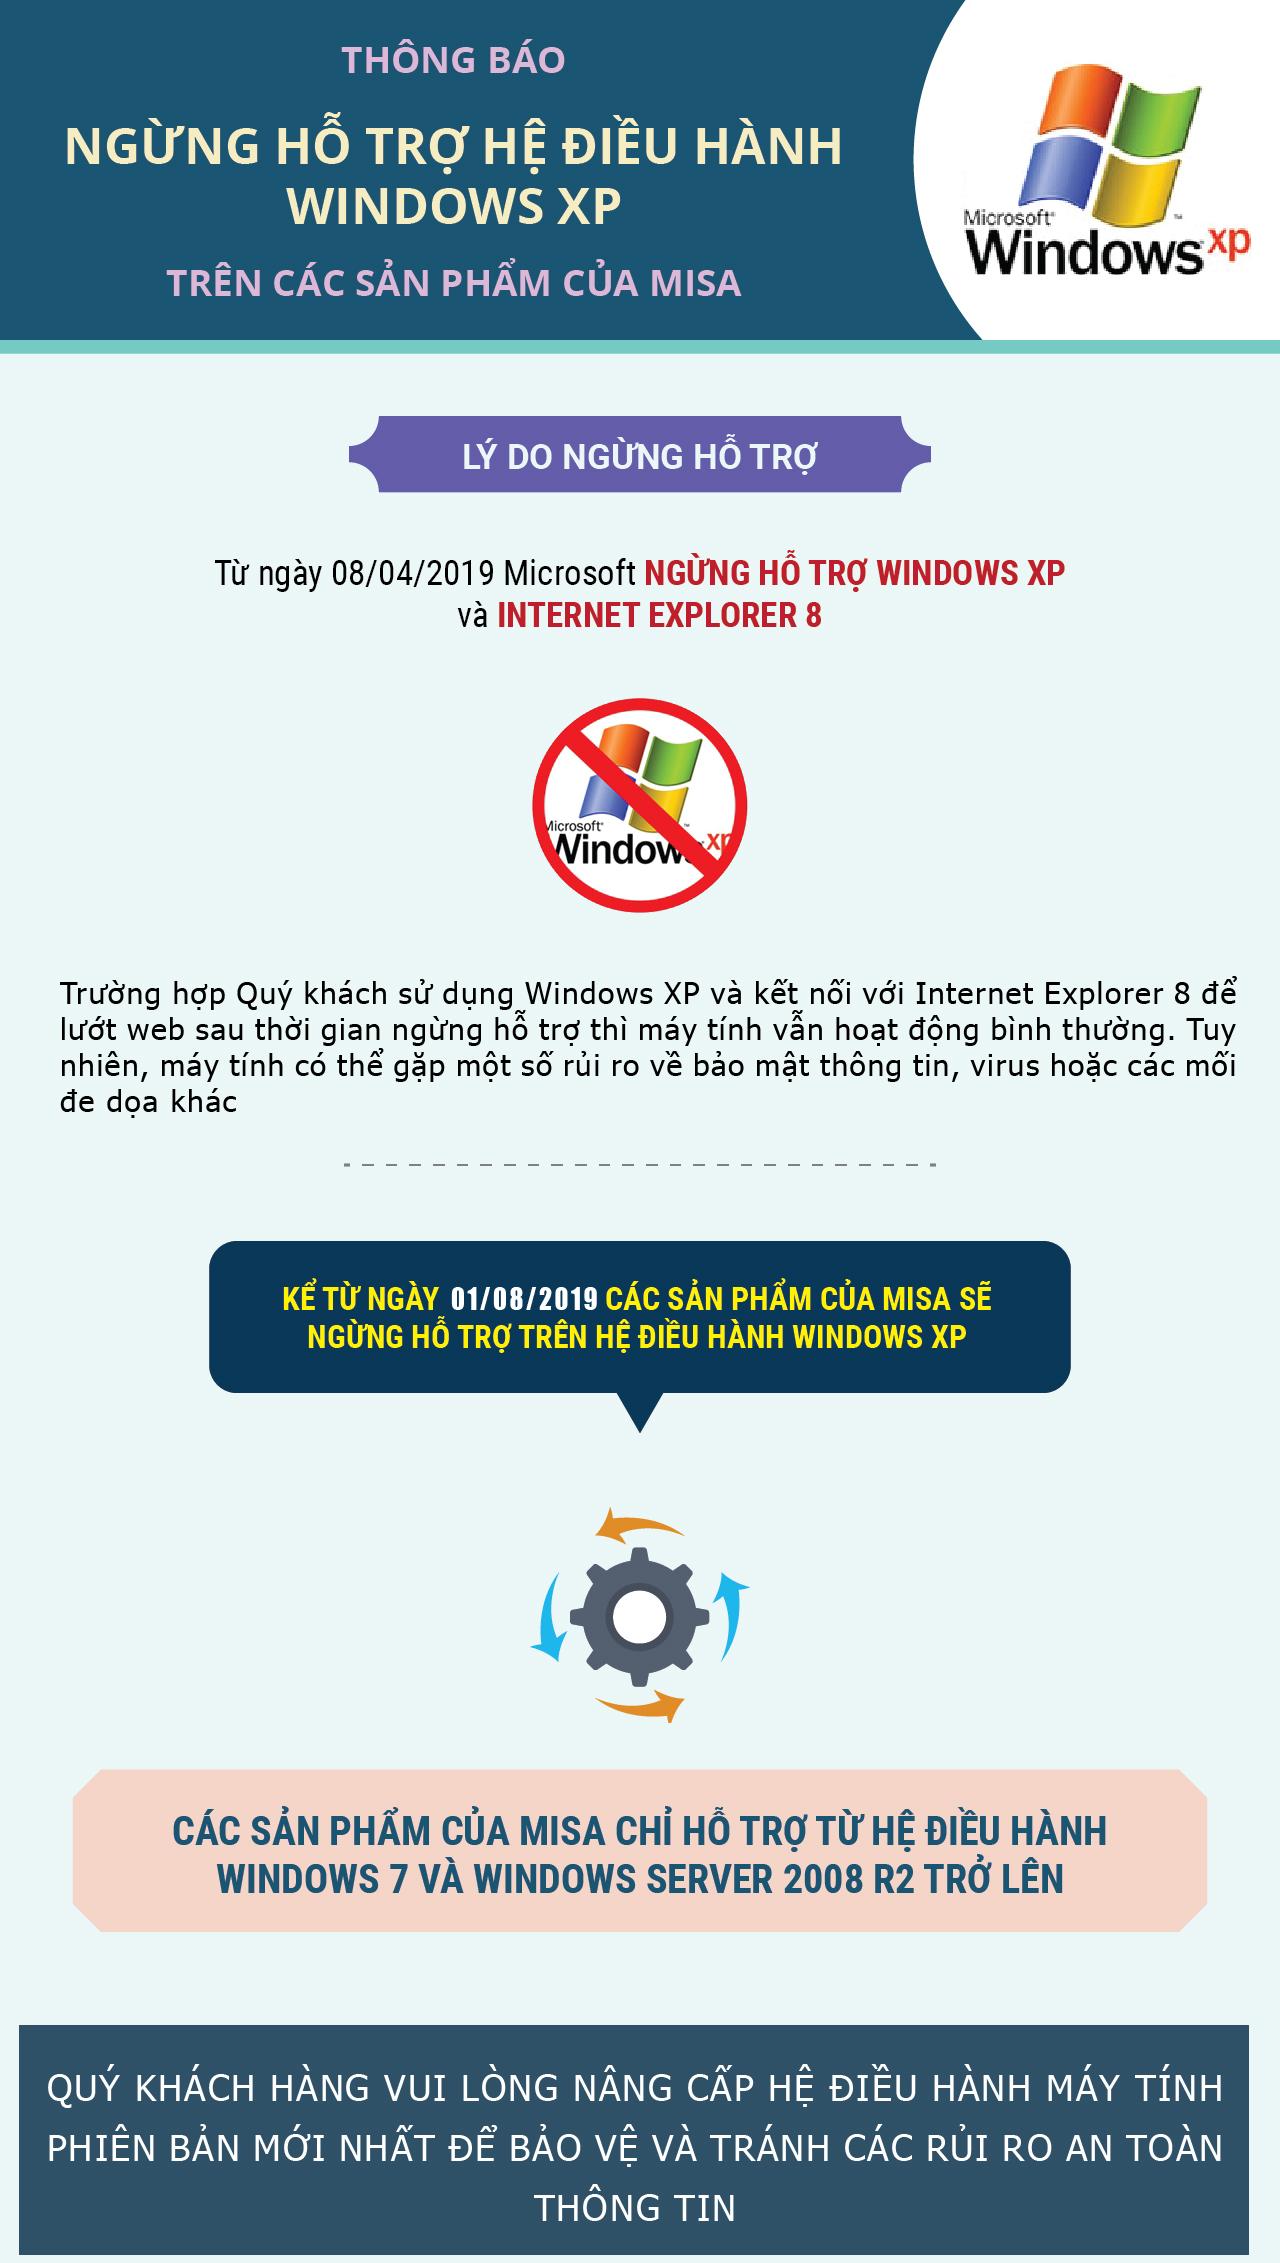 TT_Thong-bao-ngung-ho-tro-Win-XP-tren-cac-san-pham-MISA.